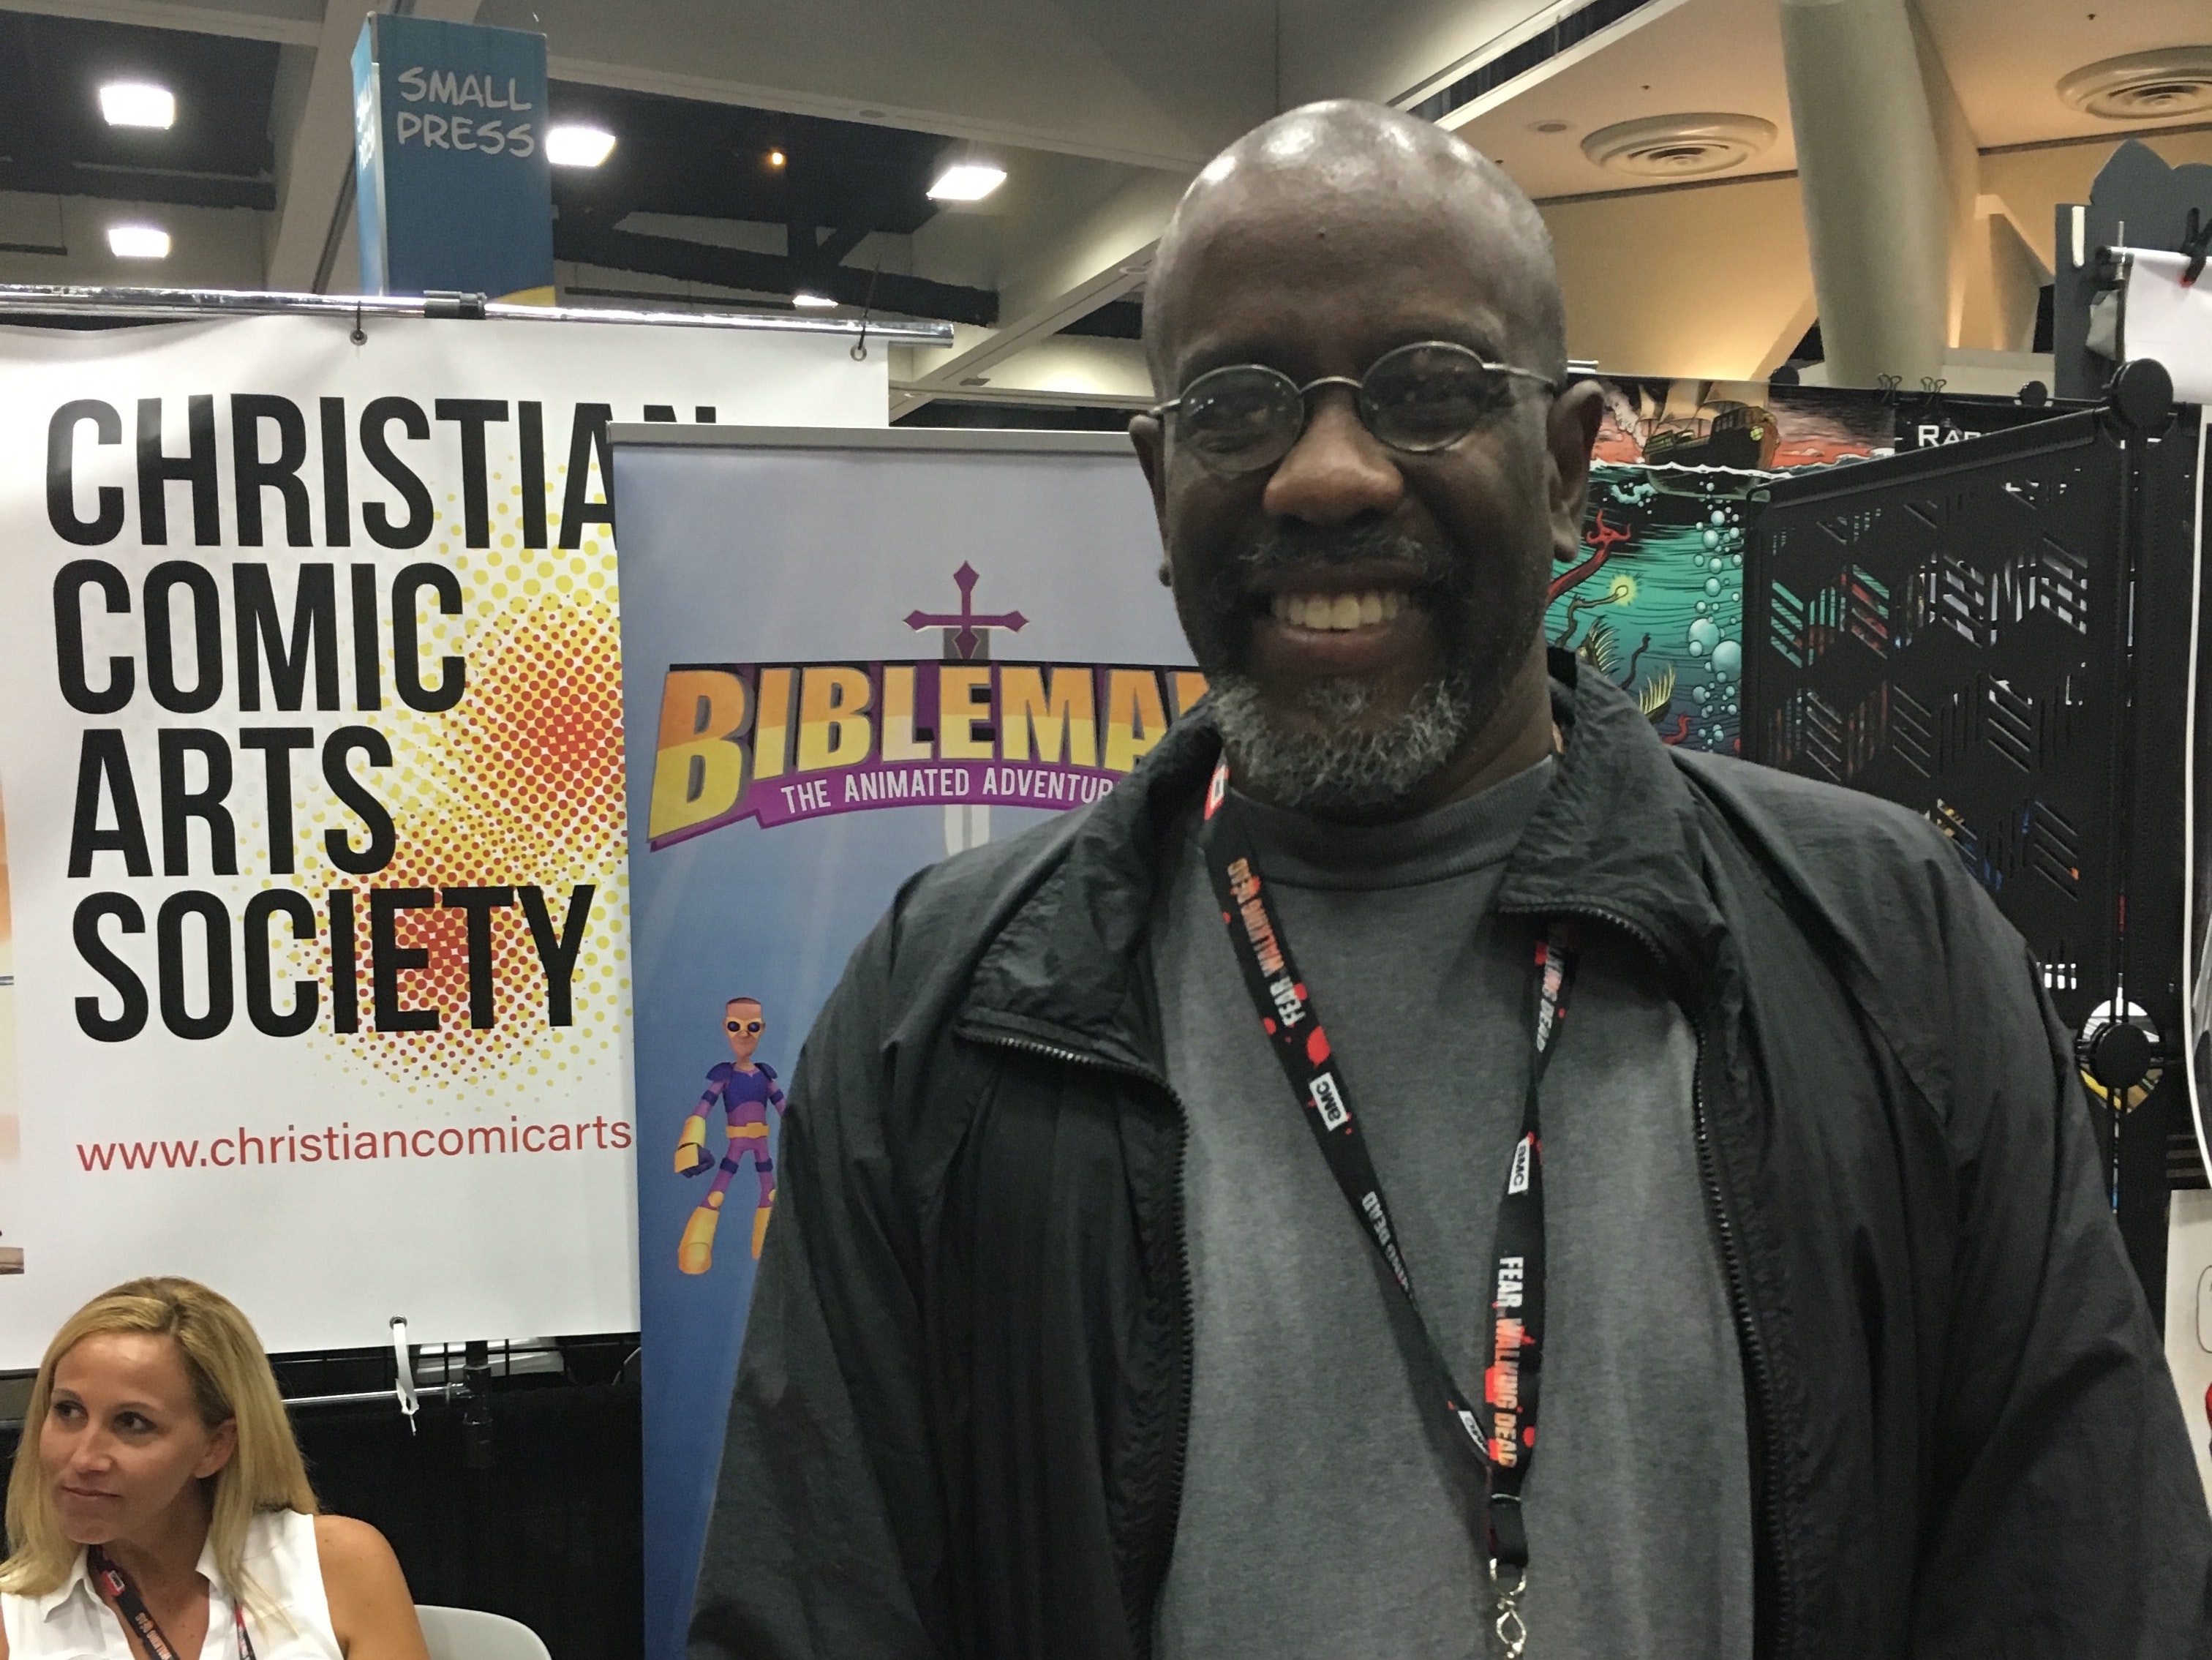 Jesus Christ, Superhero: Inside Christianity's Comic-Con Booth